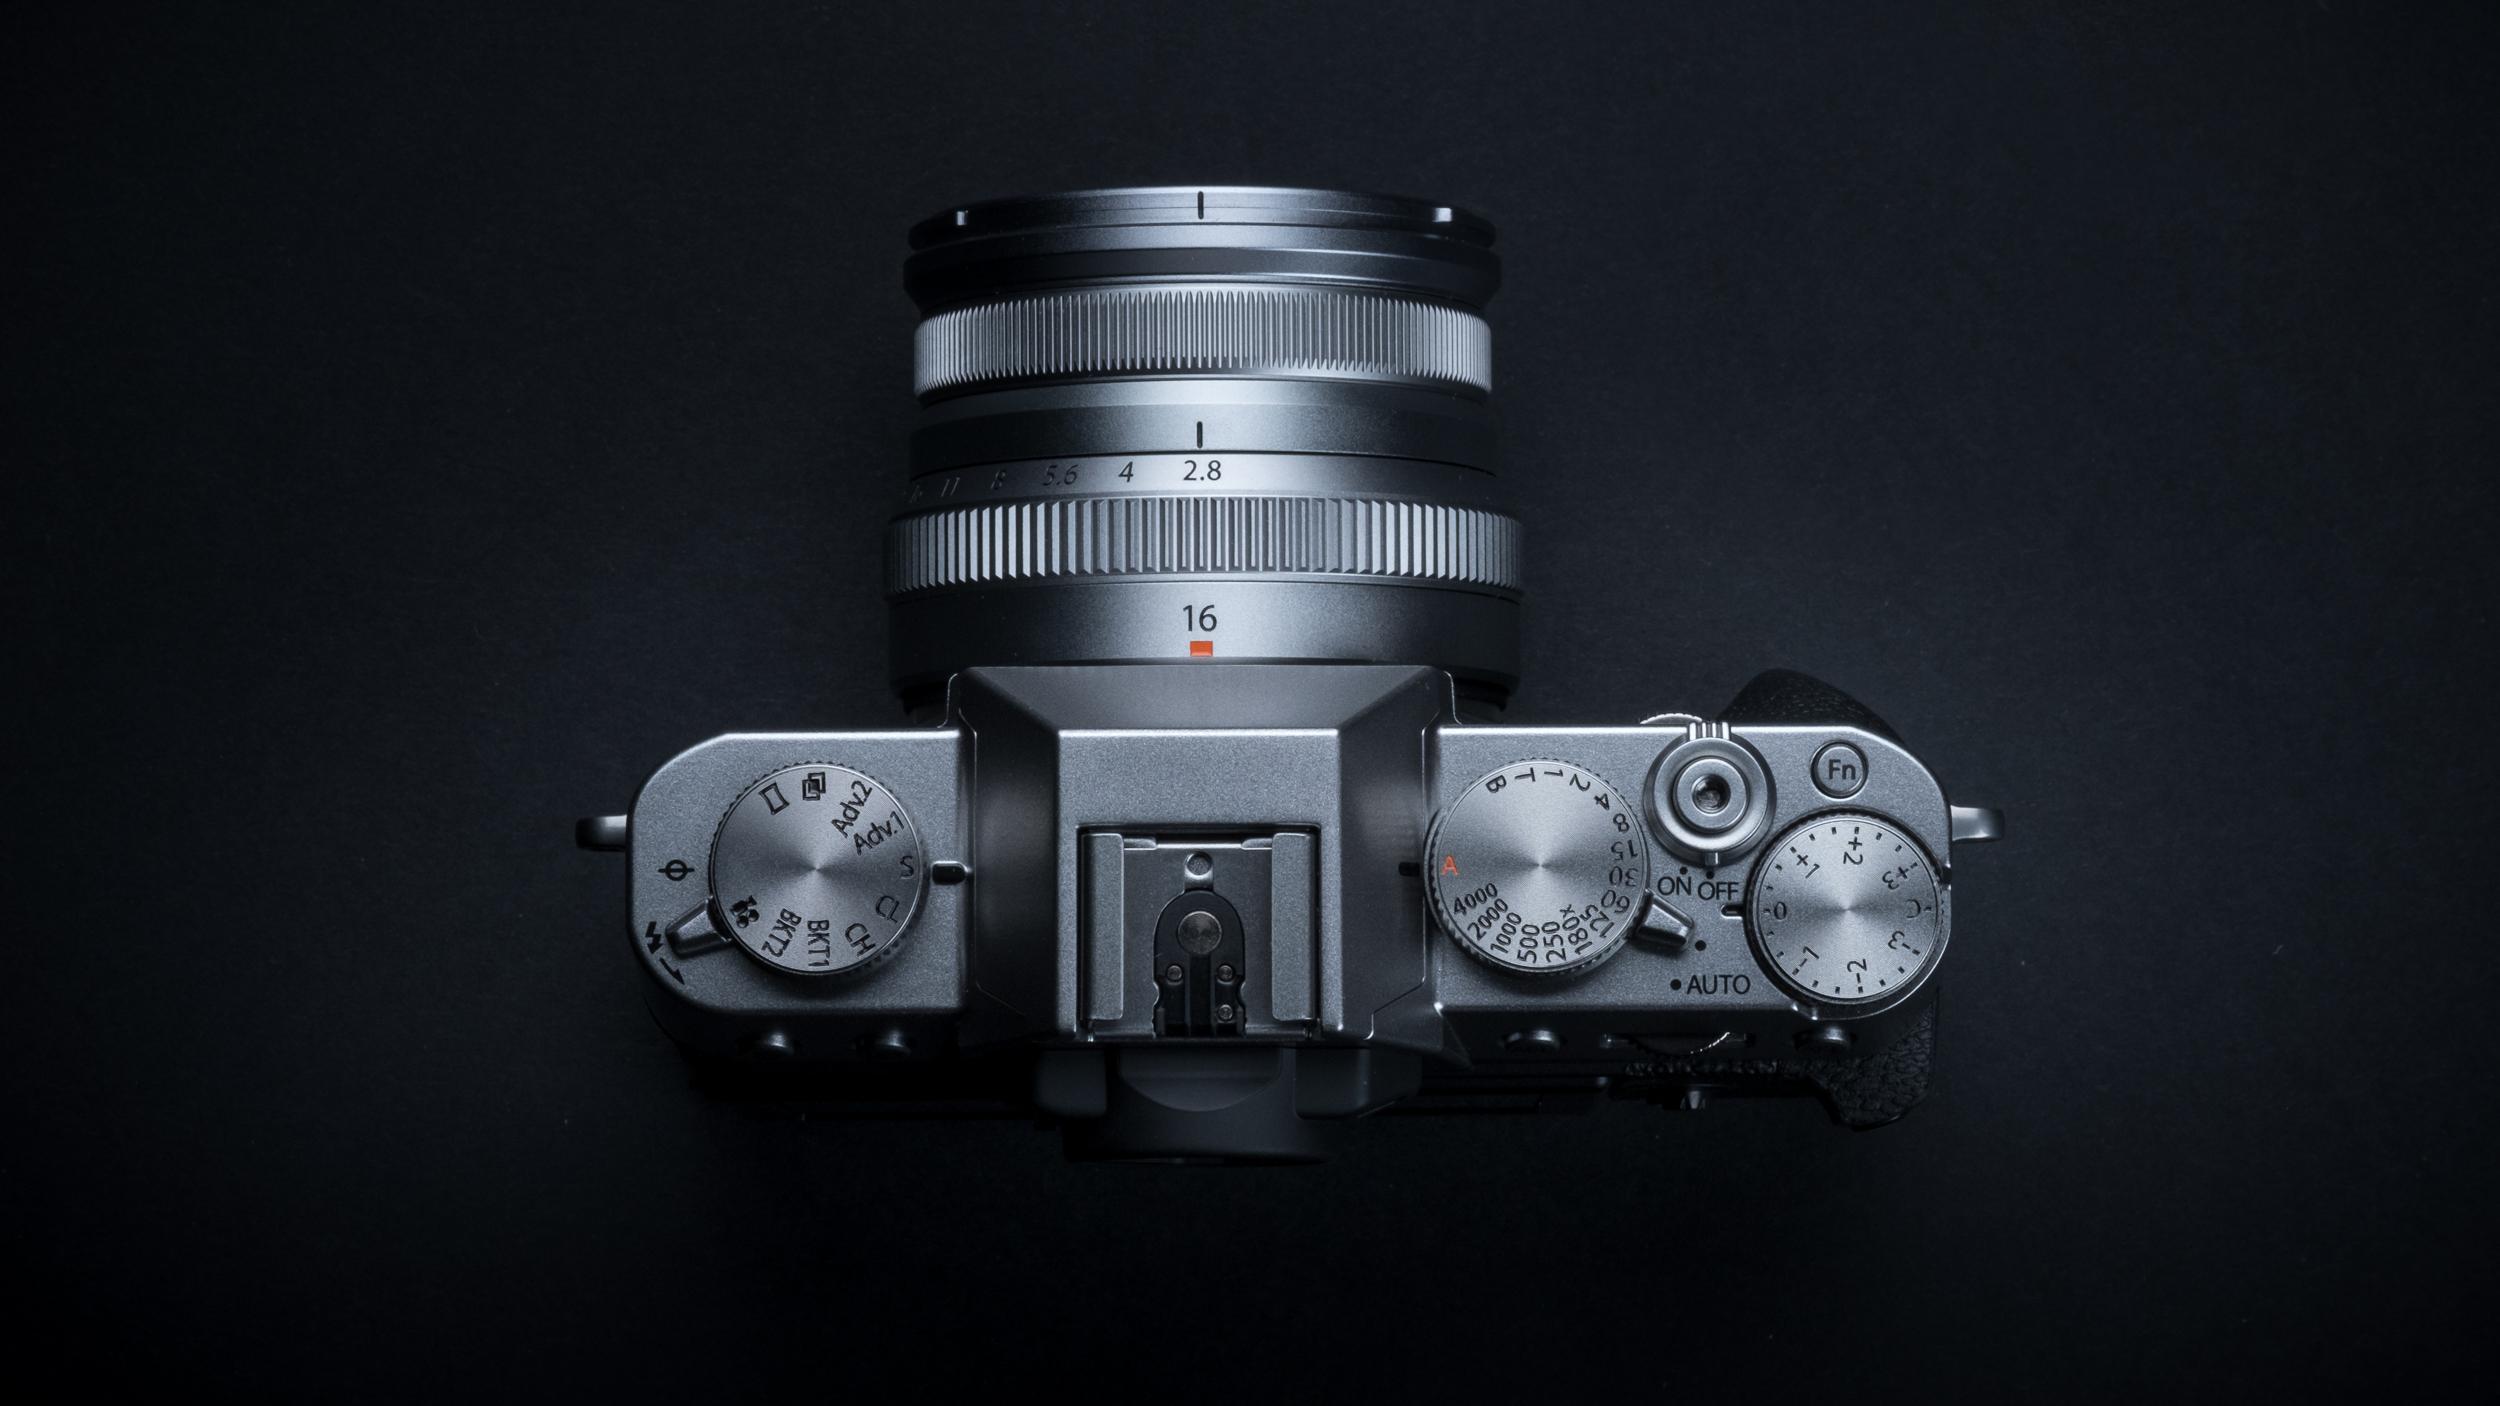 Fujifilm broadens X series with new XF16mm F2.8 R WR lens